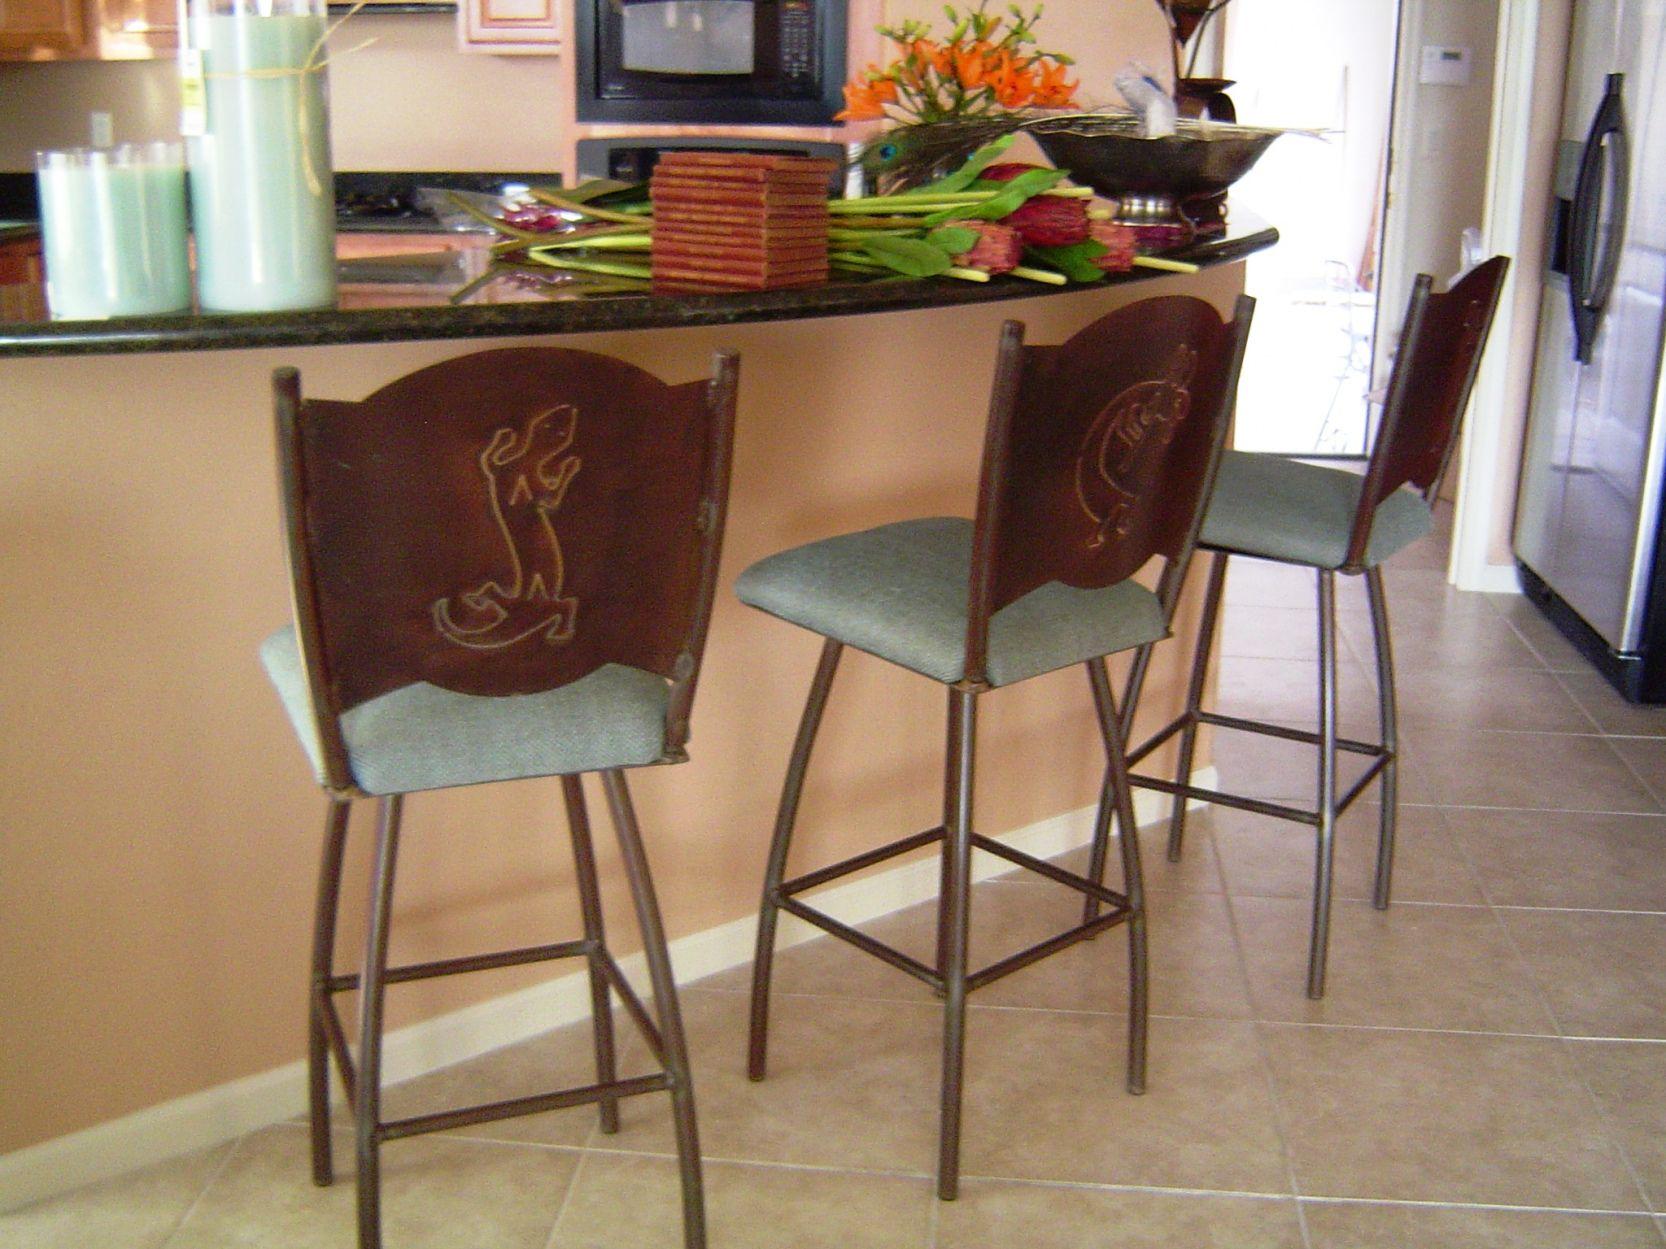 55 bar stools tucson diy modern furniture check more at http